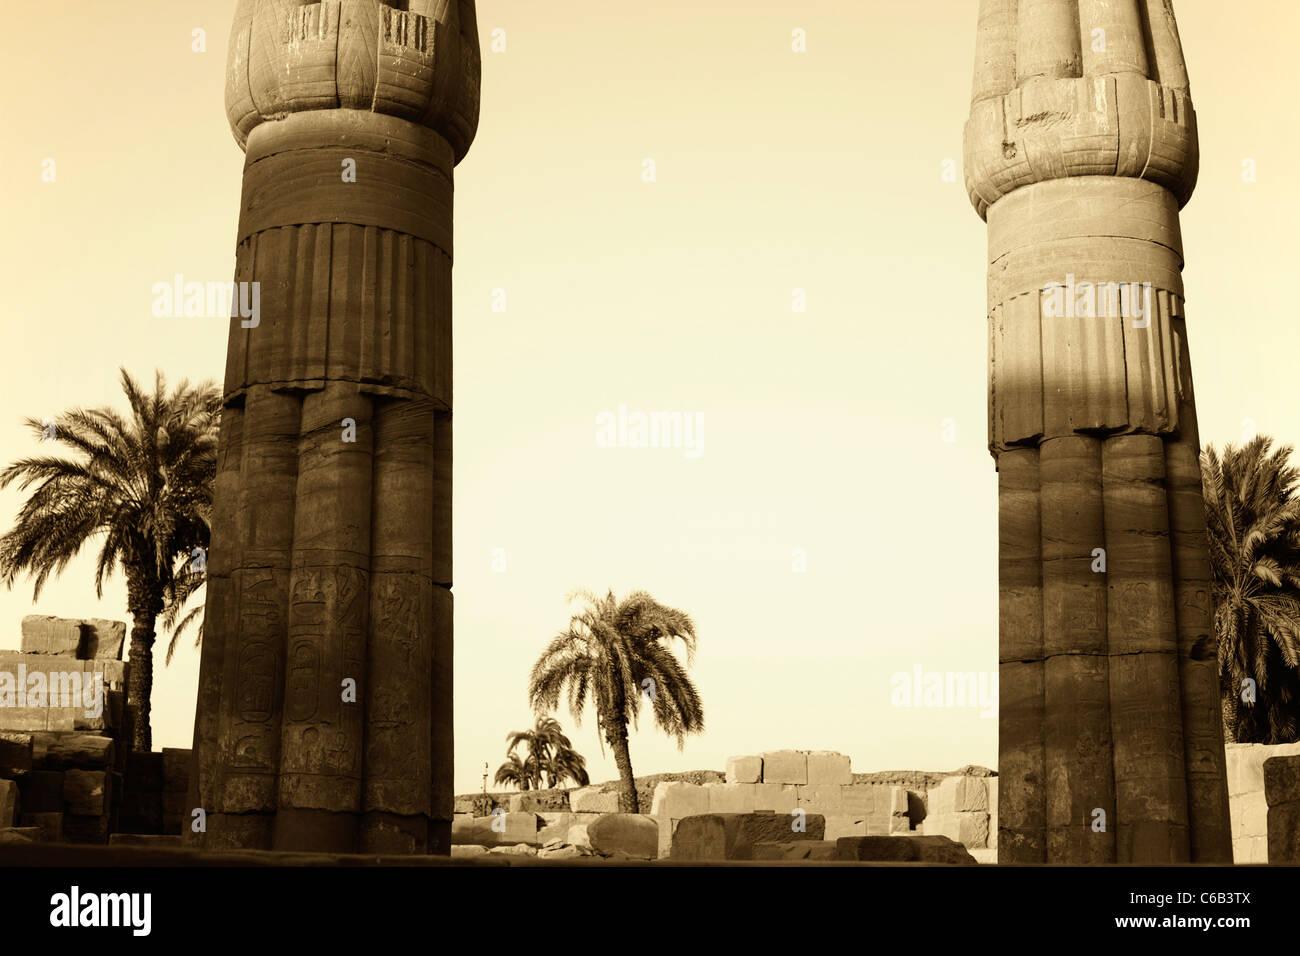 victorian era style image of ancient columns at karnak temple